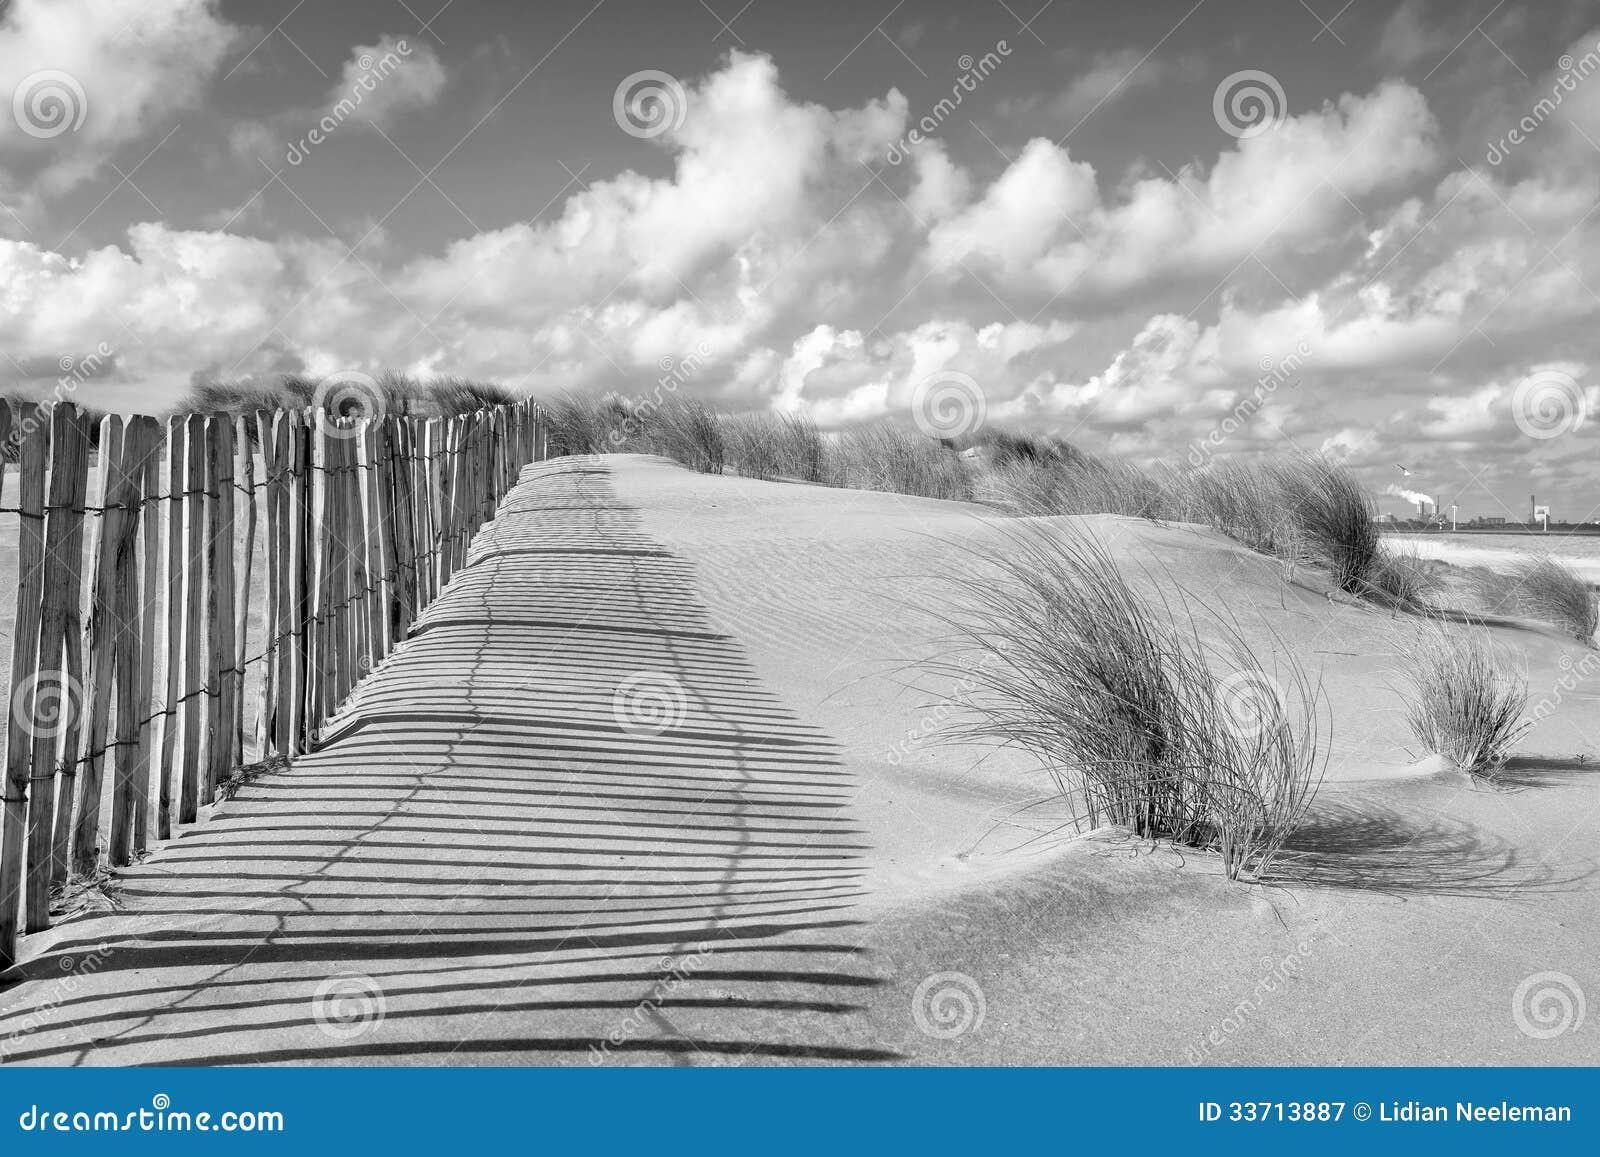 Dune landscape and fence in black and white stock image image 33713887 - Poel van blanco hoek ...